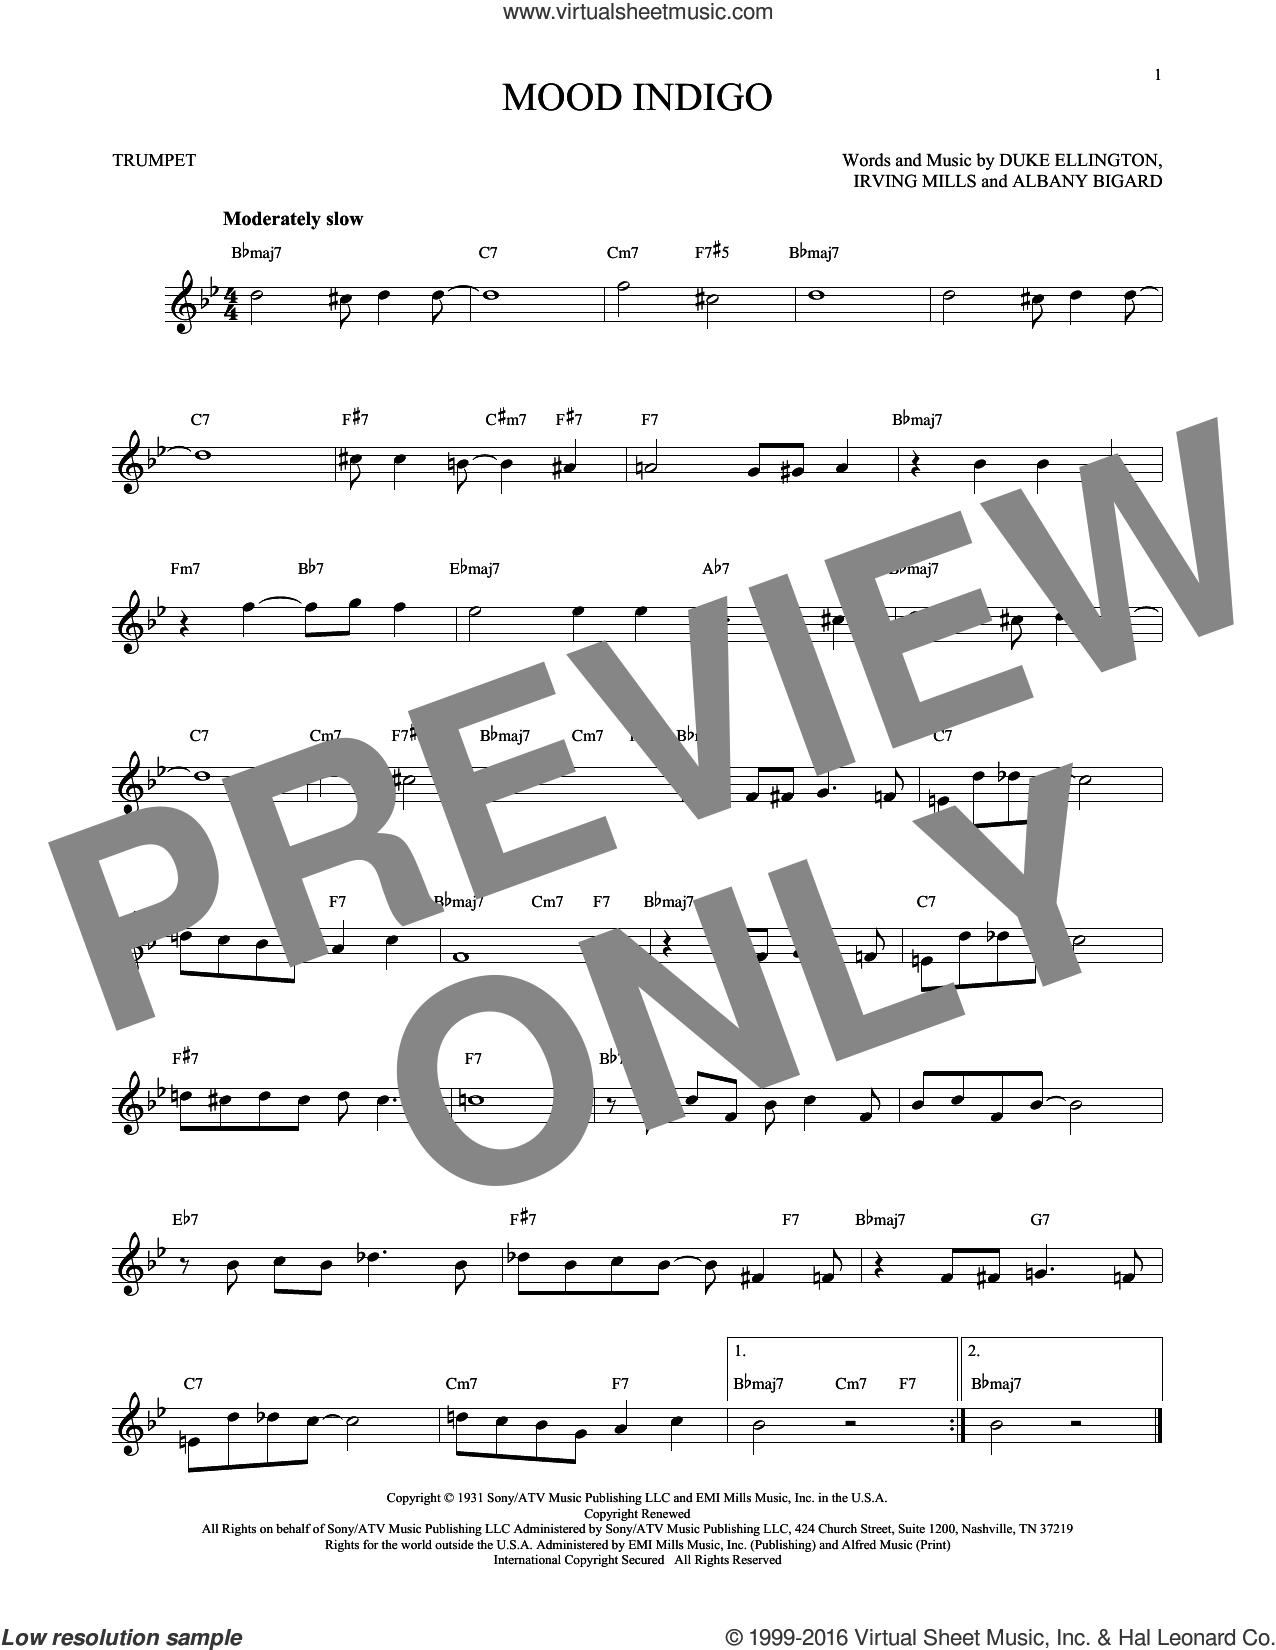 Mood Indigo sheet music for trumpet solo by Duke Ellington, Albany Bigard and Irving Mills, intermediate skill level